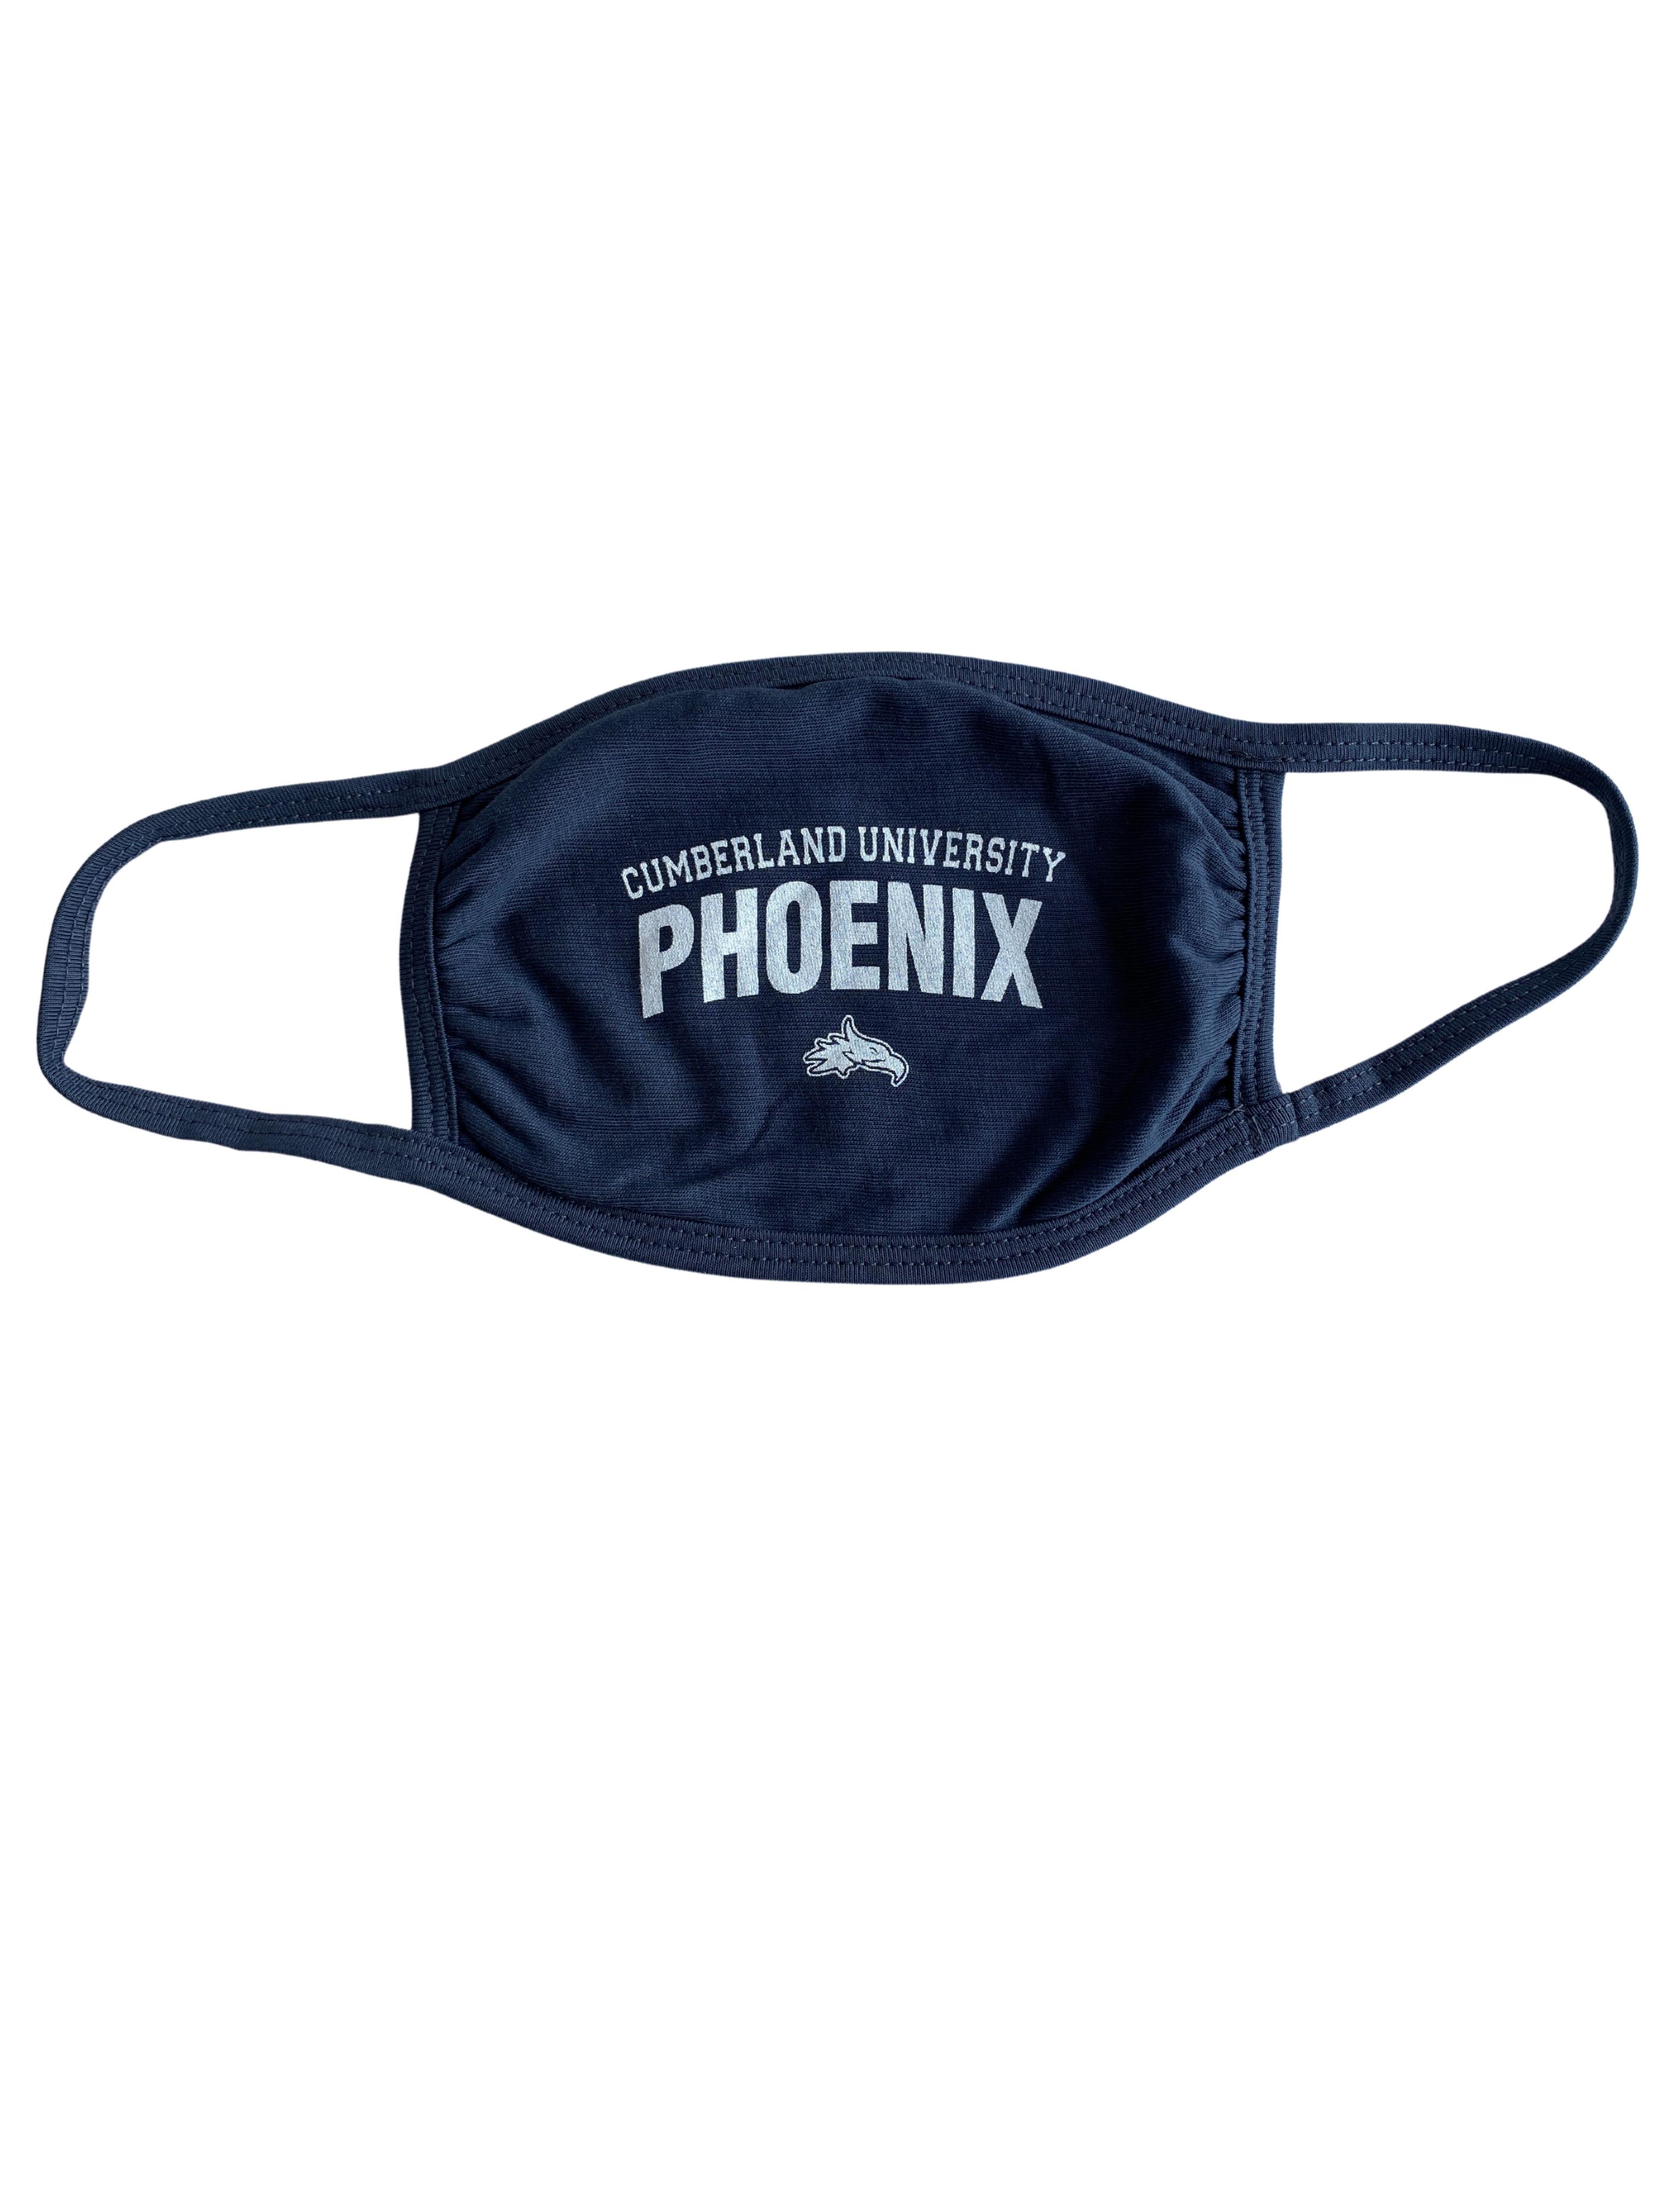 Cumberland University Phoenix Reusable Face Mask